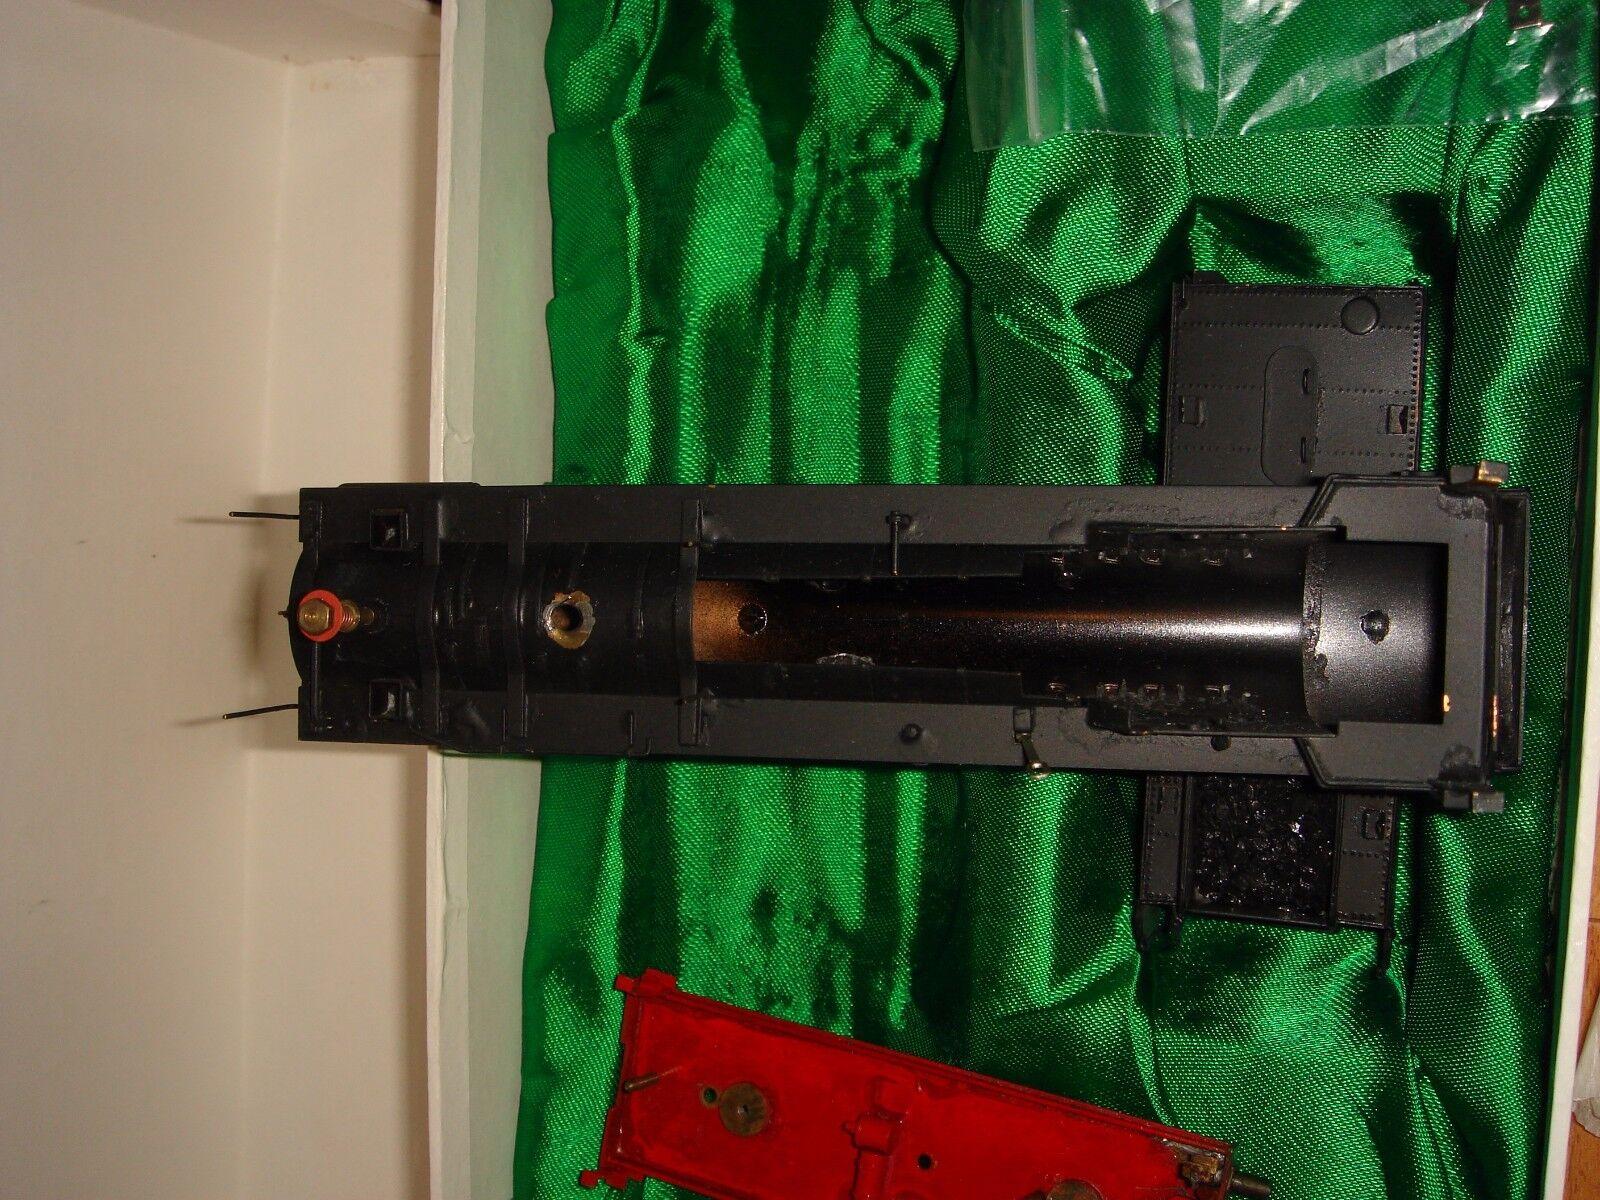 Ferrovia FULGUREX ® h0 h0 h0 in puro vapore Live SUPER RARO KIT in ottone 2450,00 EURO b371ba